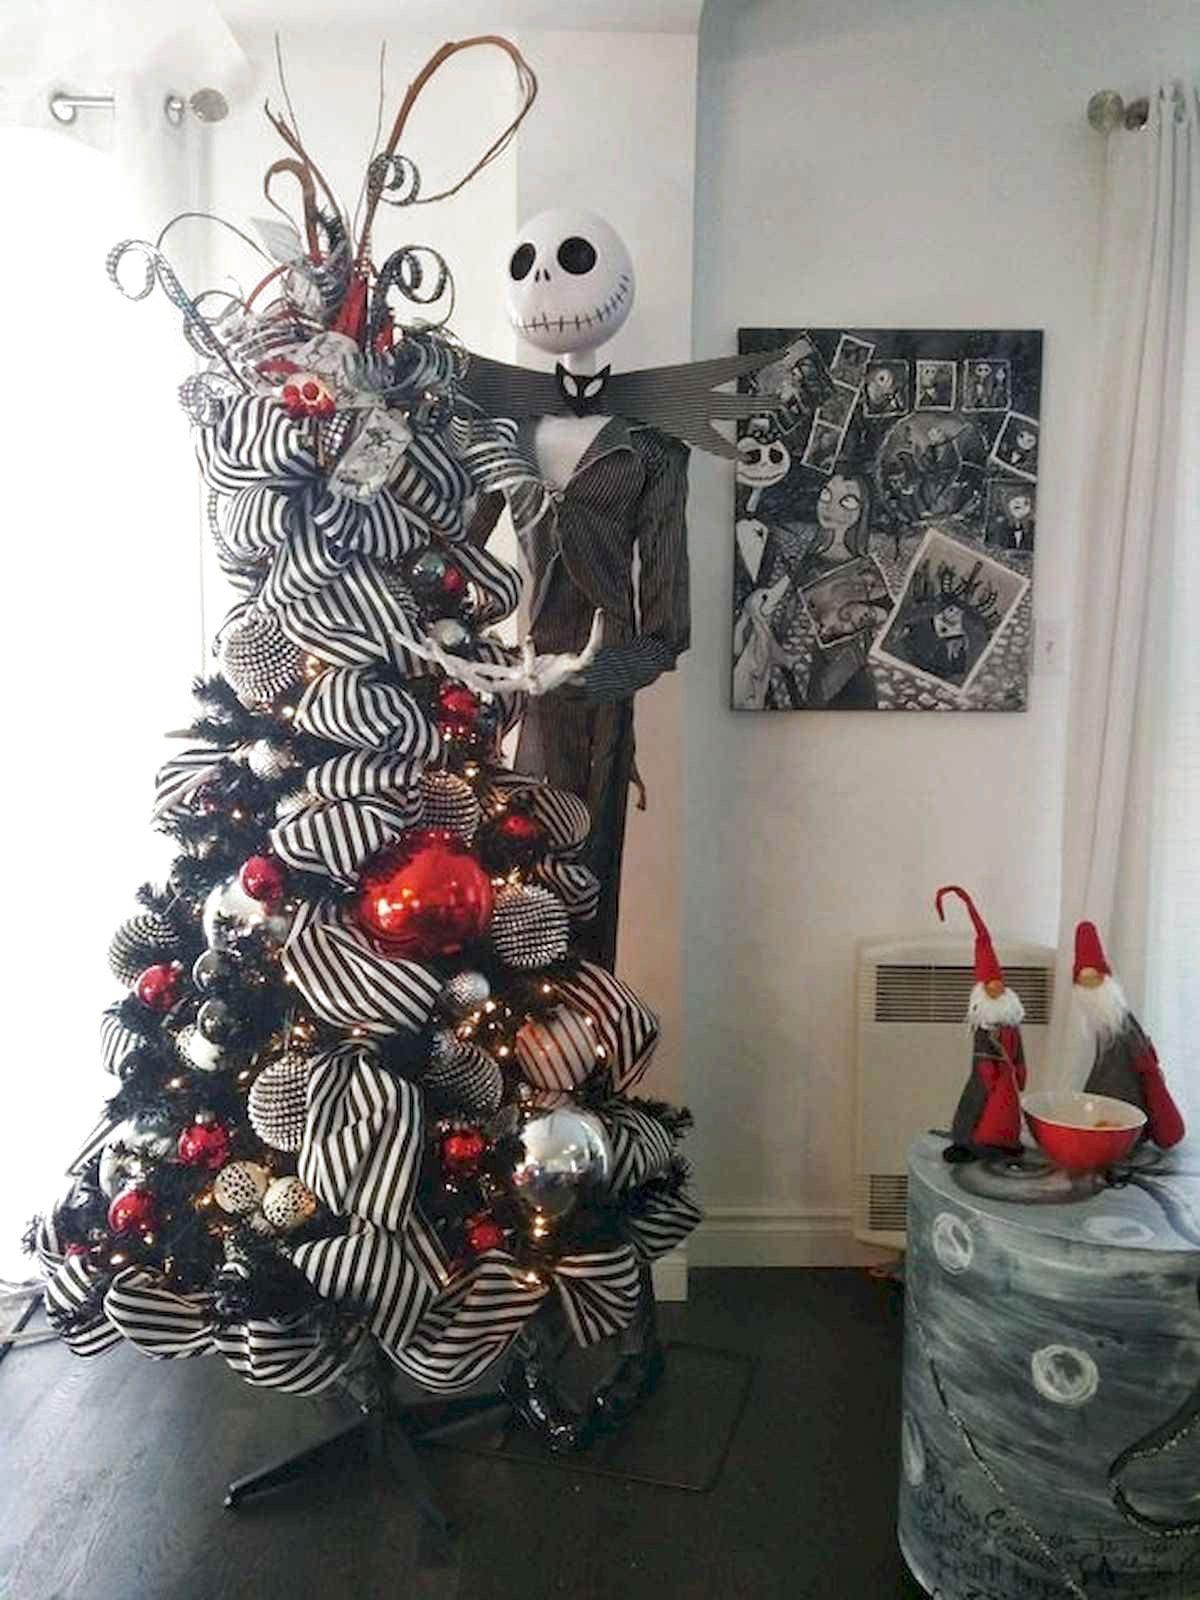 62 Favourite Diy Halloween Decorations Ideas The Expert Beautiful Ideas Nightmare Before Christmas Tree Nightmare Before Christmas Decorations Halloween Christmas Tree